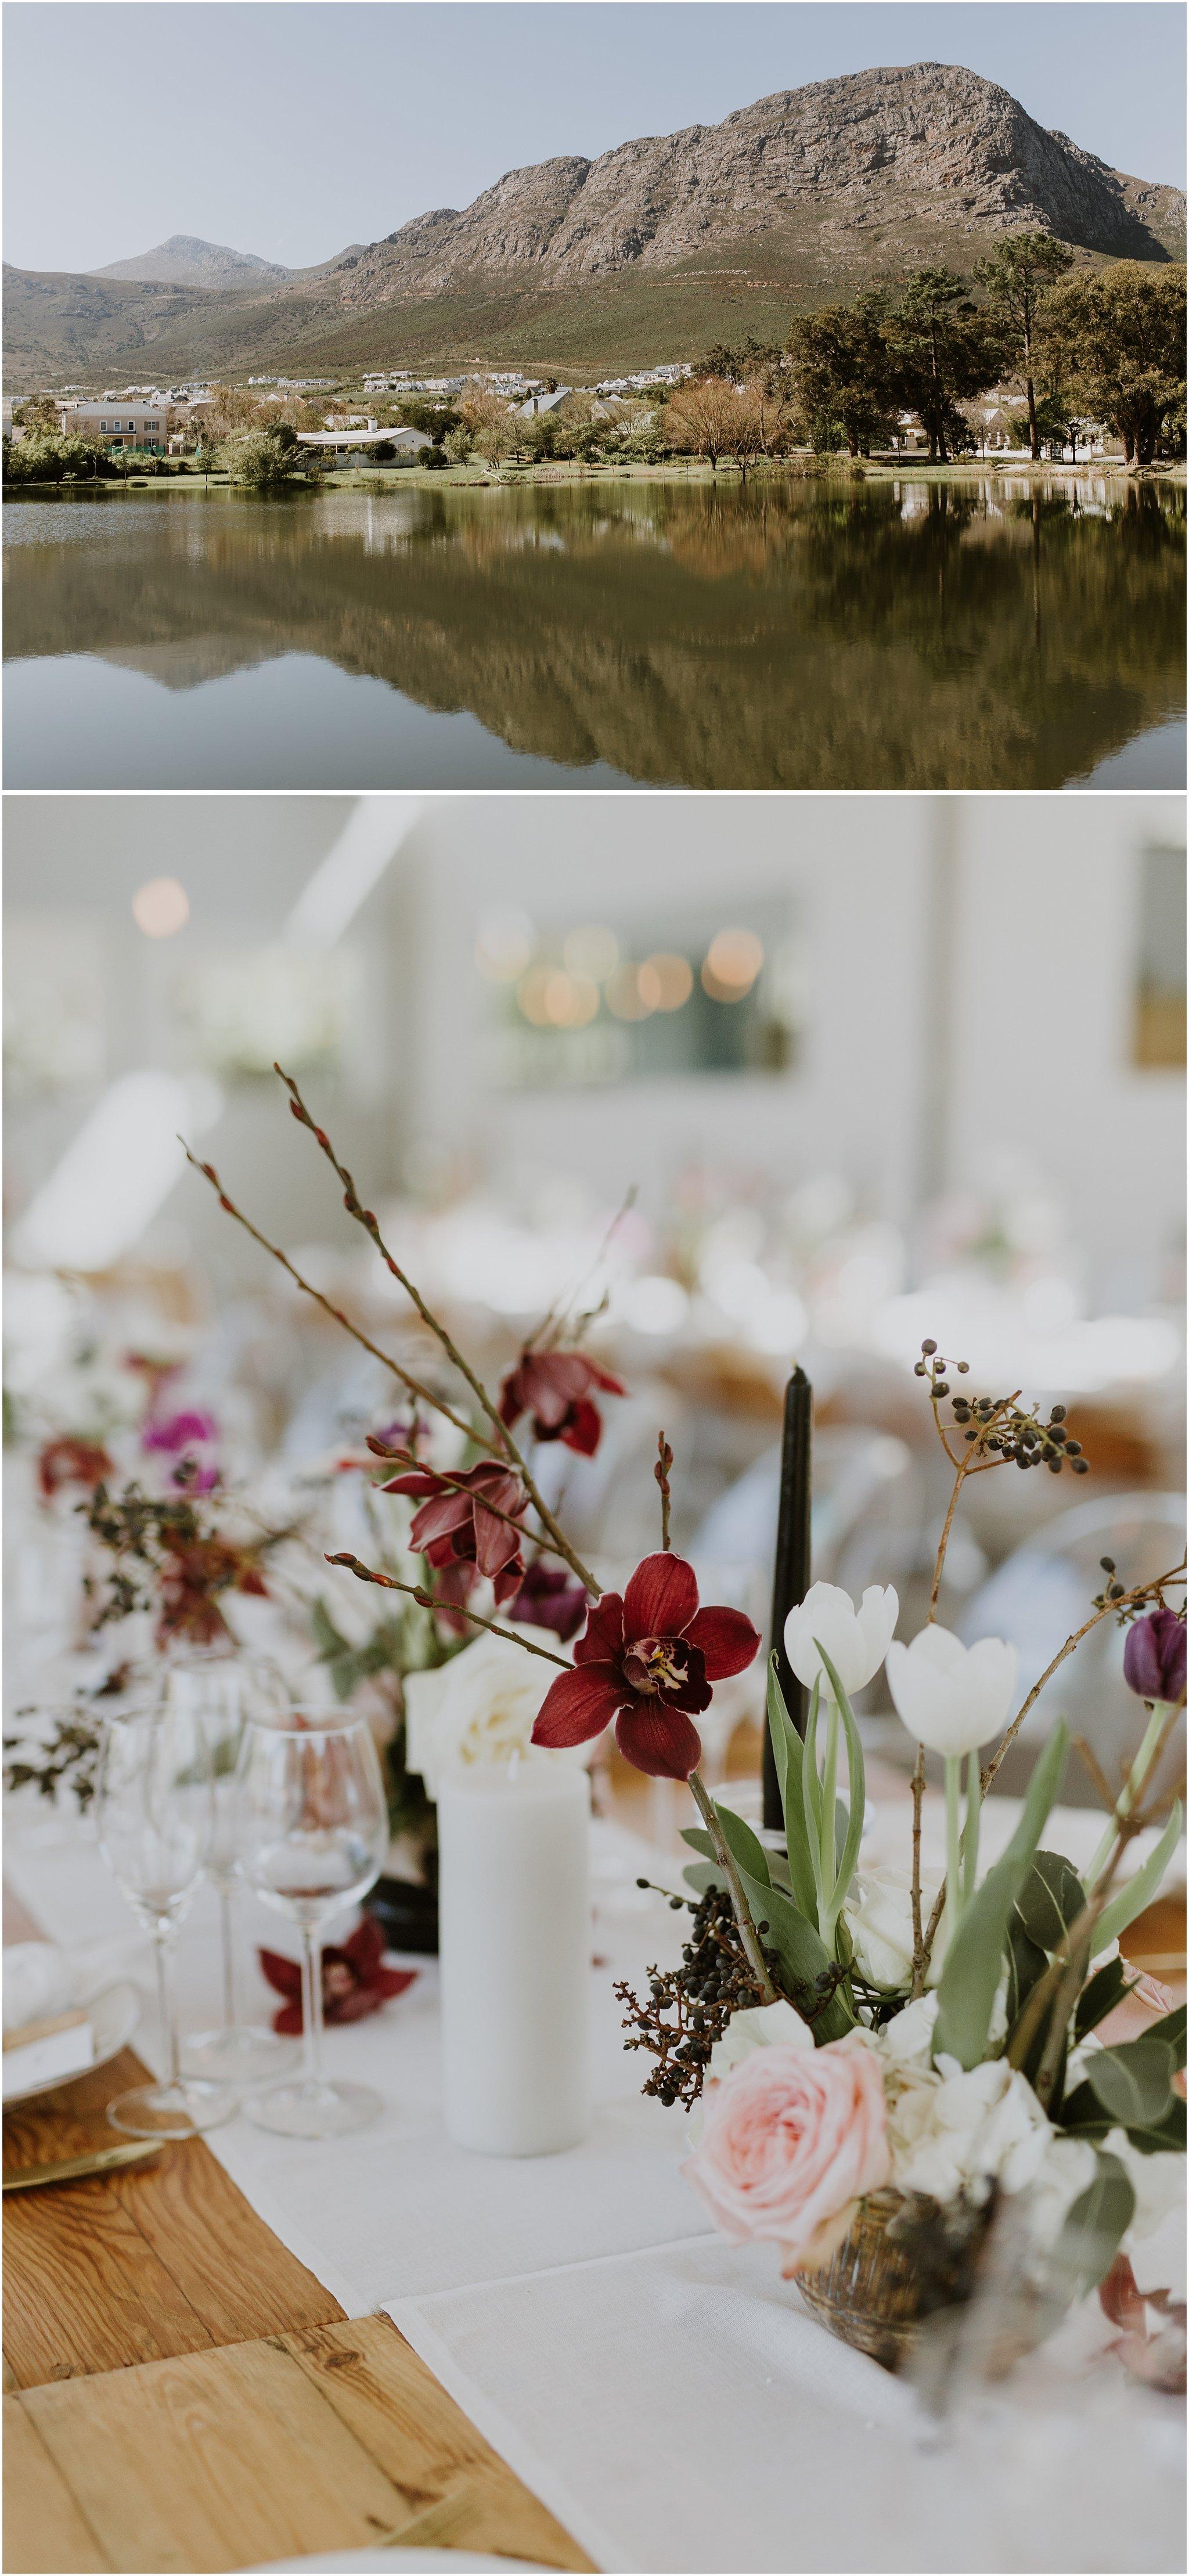 Cape Town Wedding Photographer / Sverige Bröllopsfotograf